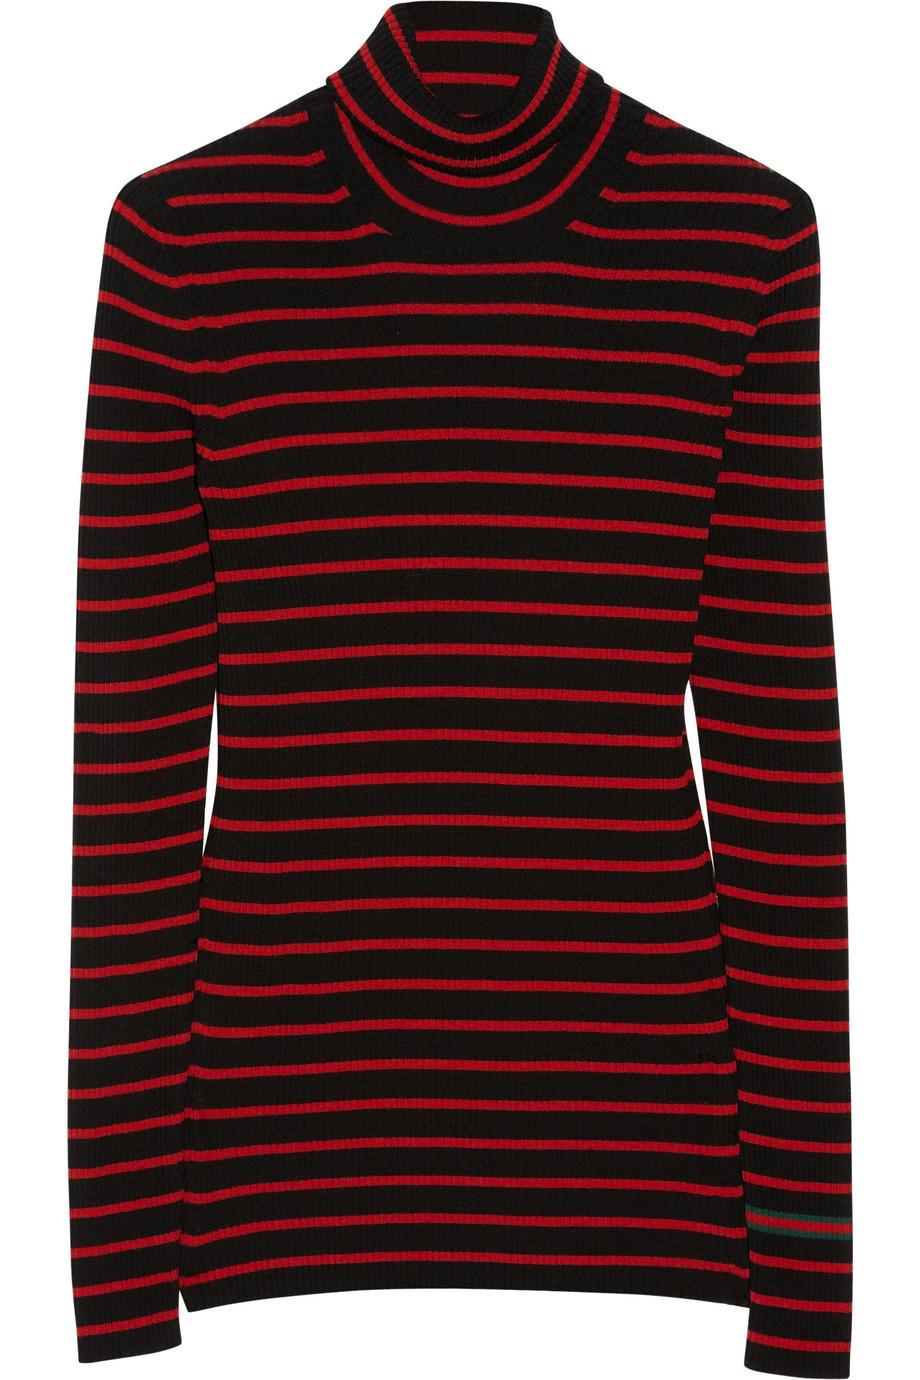 Gucci Striped Wool Turtleneck Sweater, Size: XXL